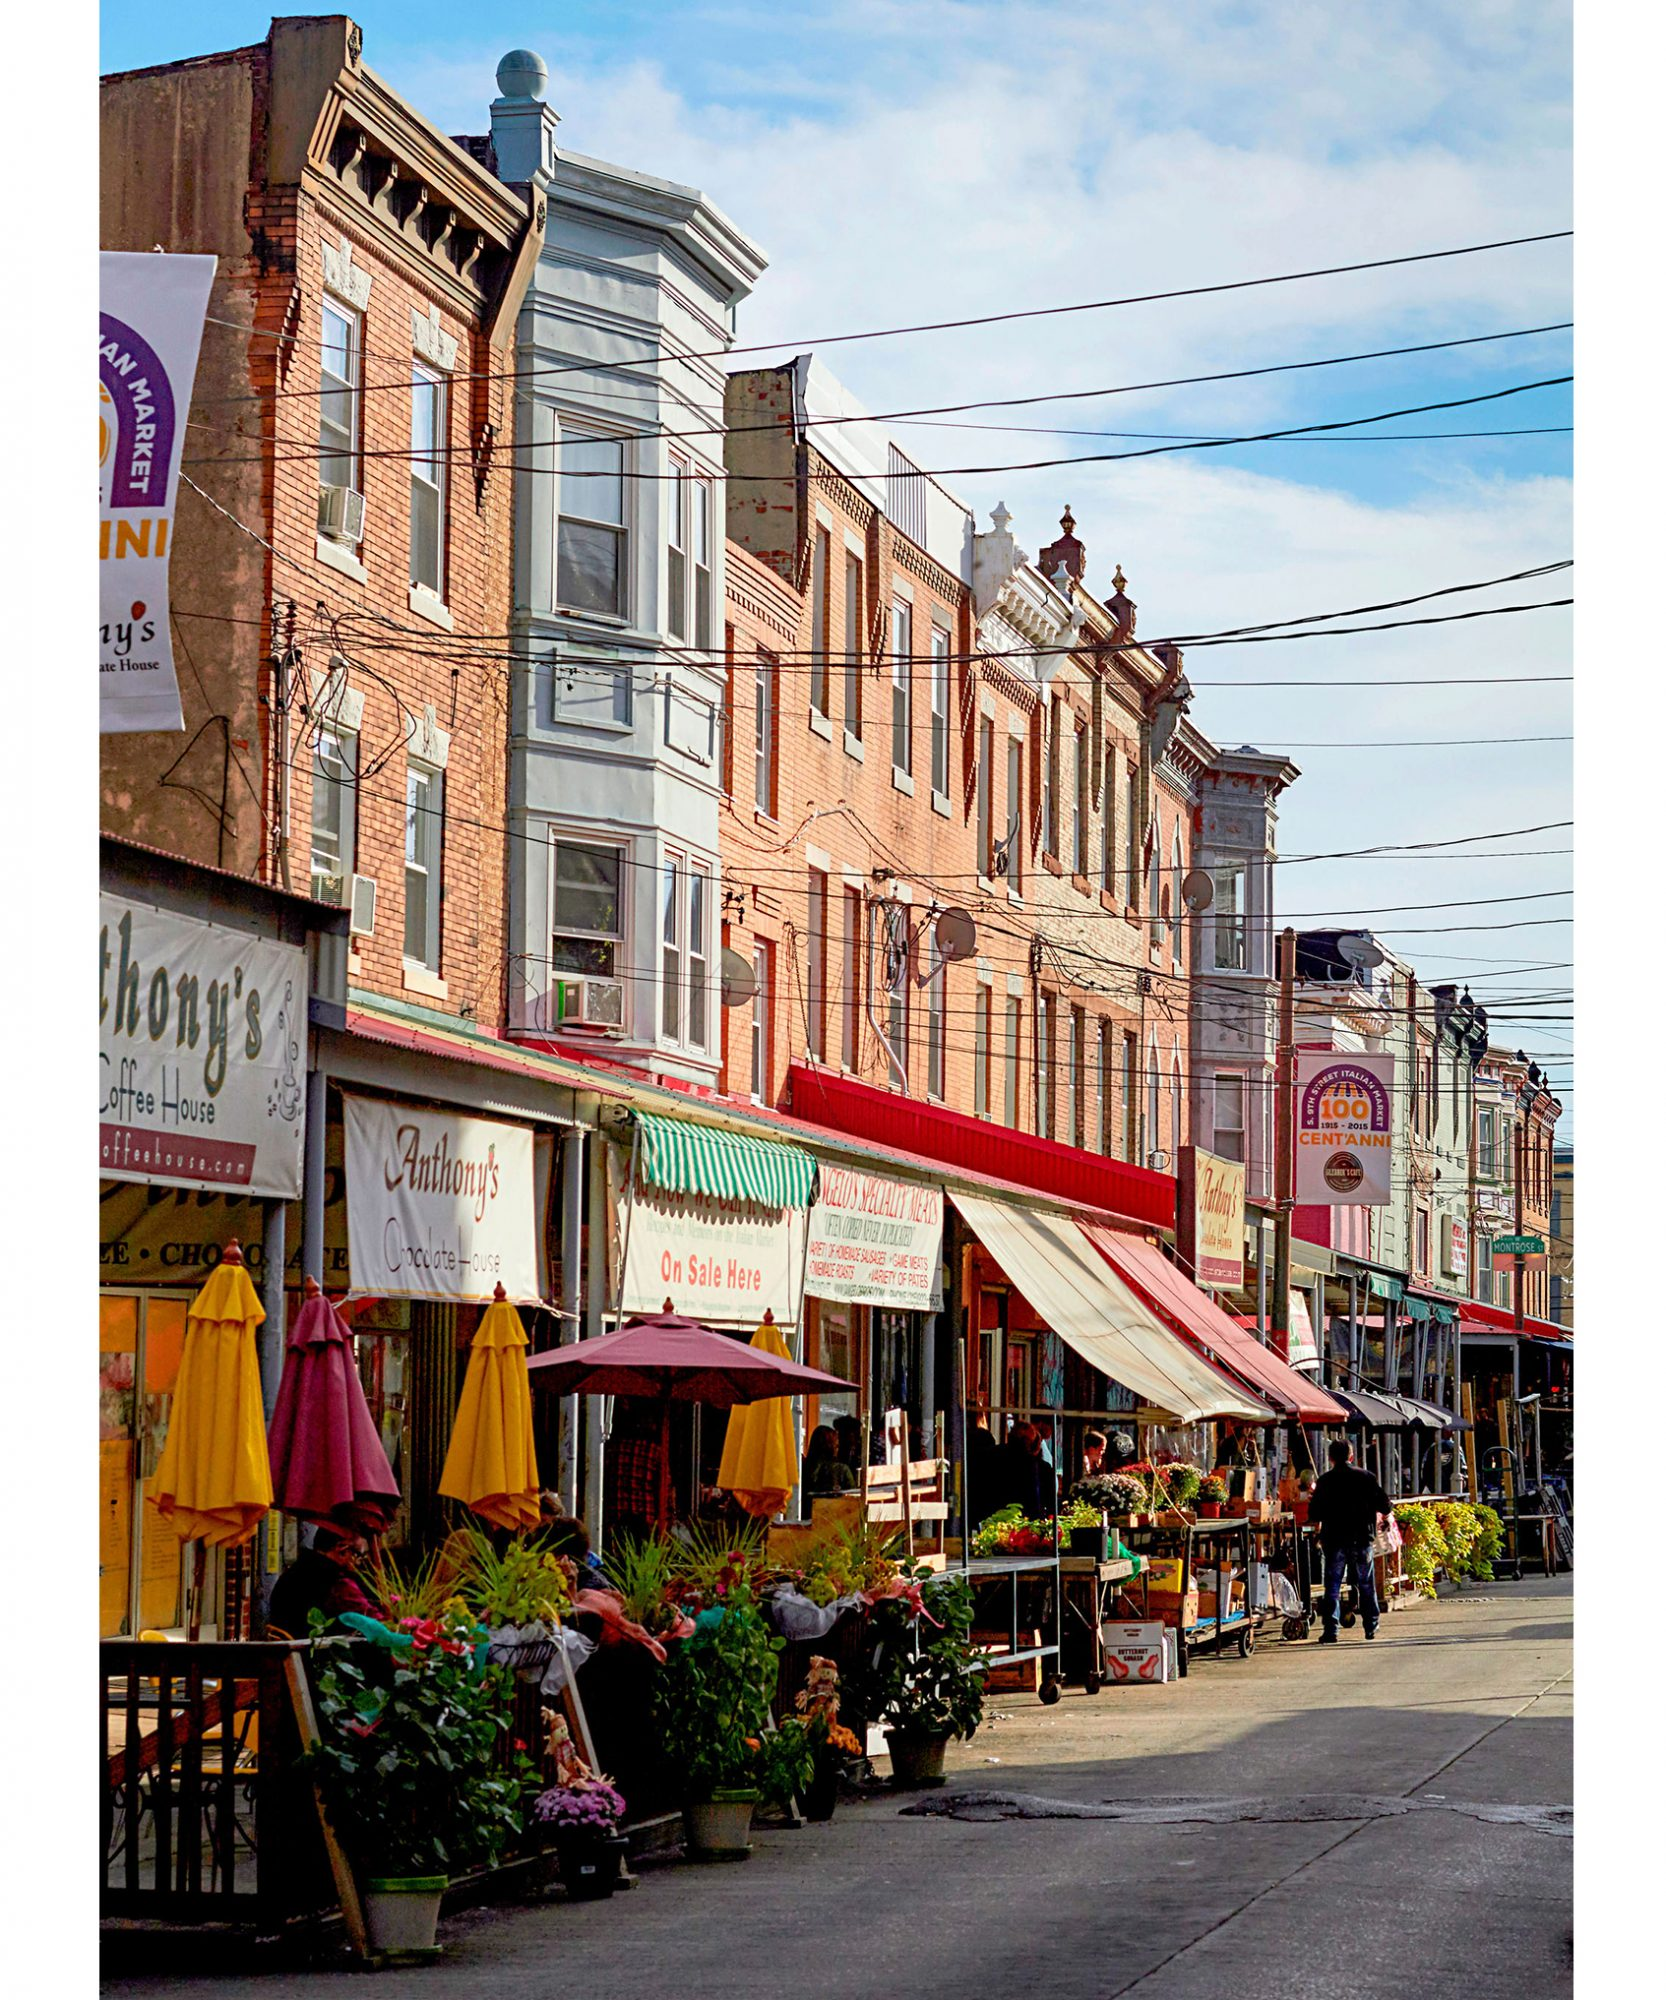 9th street italian market philadelphia